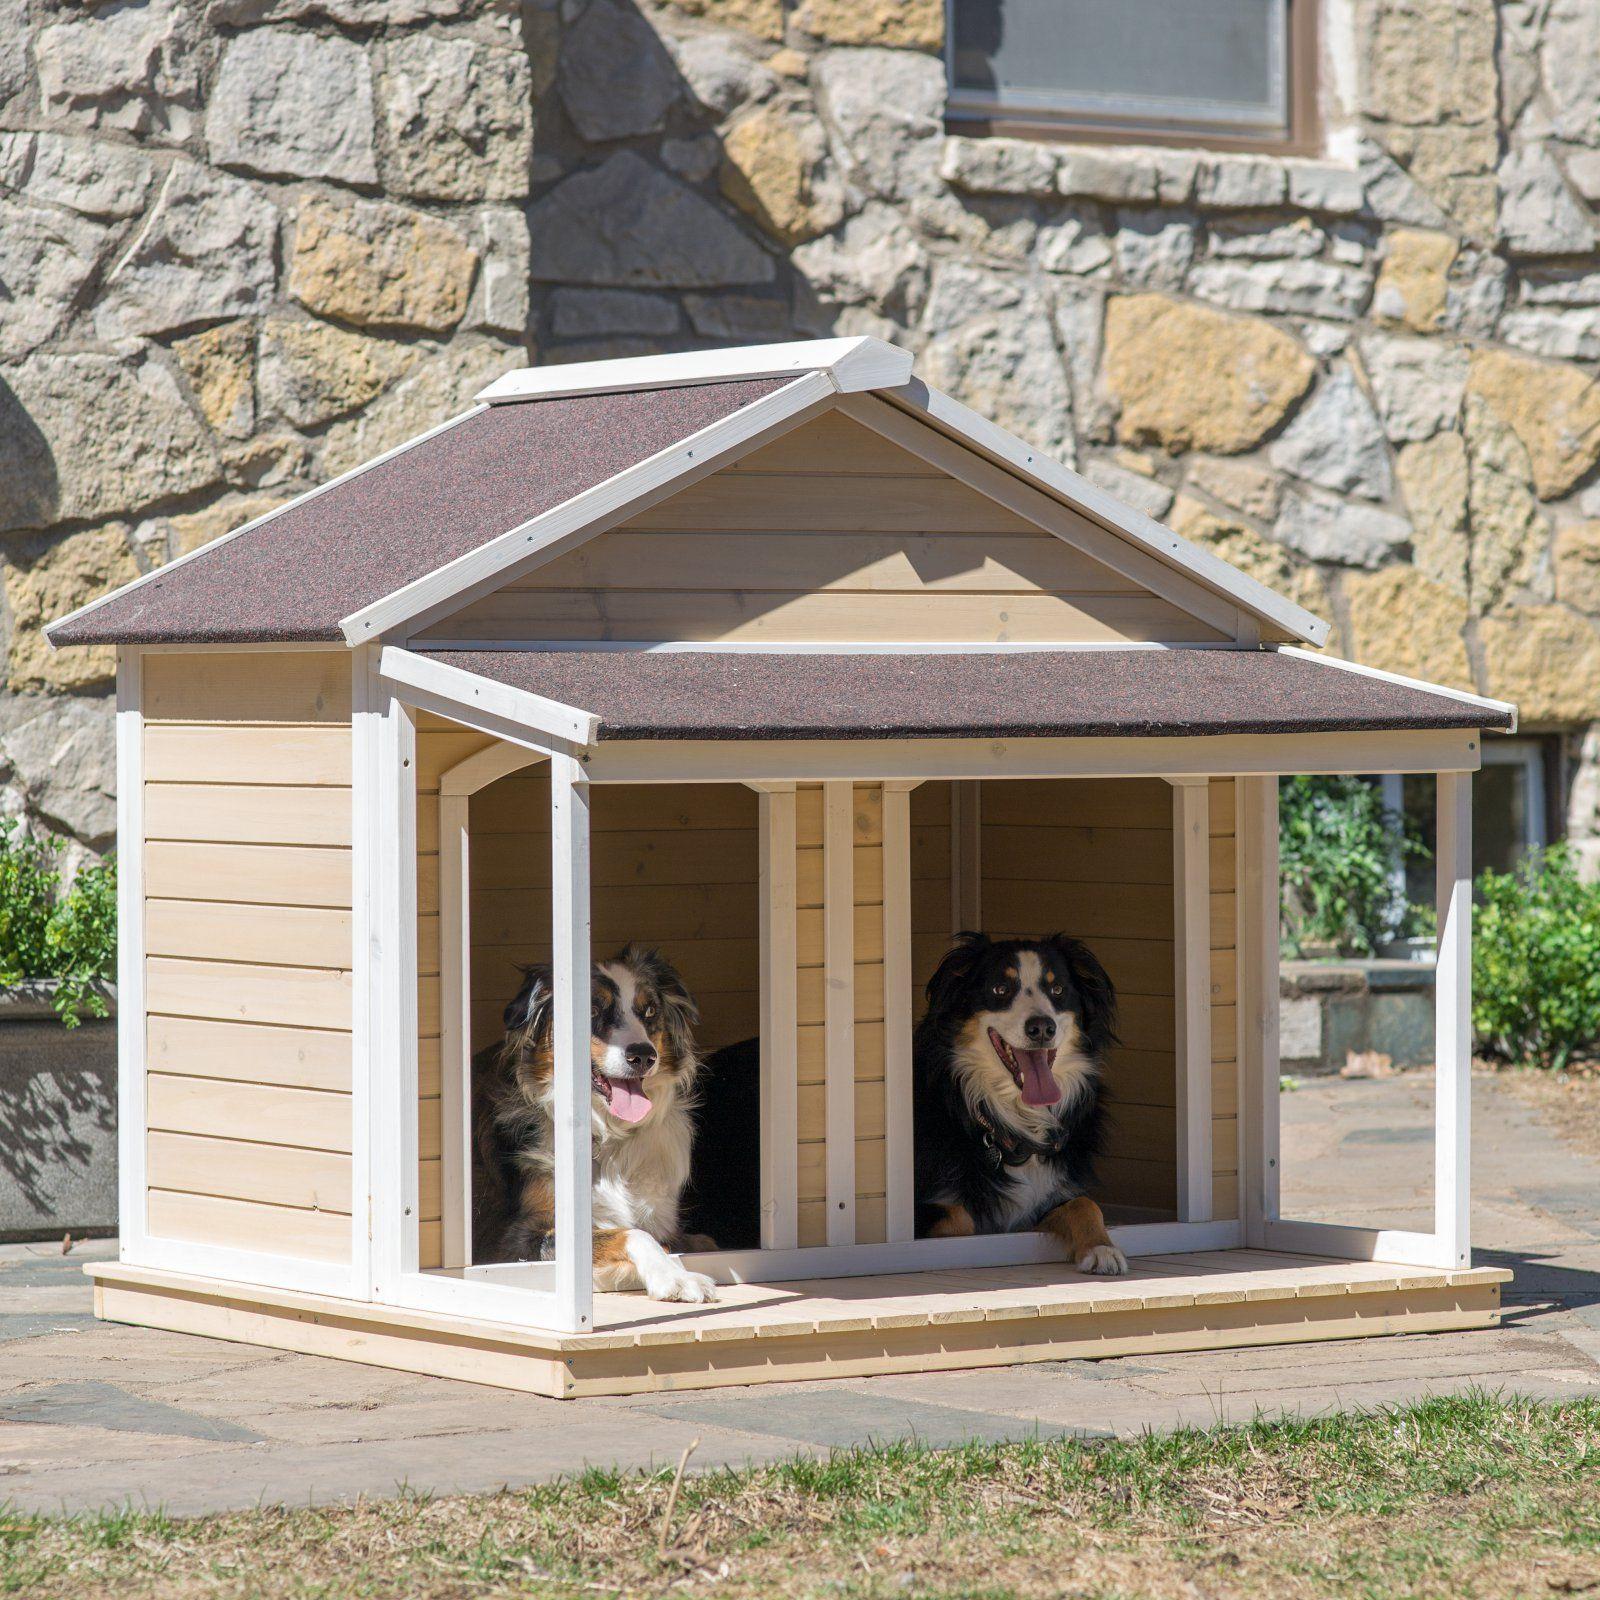 Boomer & George Duplex Dog House, Medium, 51″x43″x43″, Antiq…